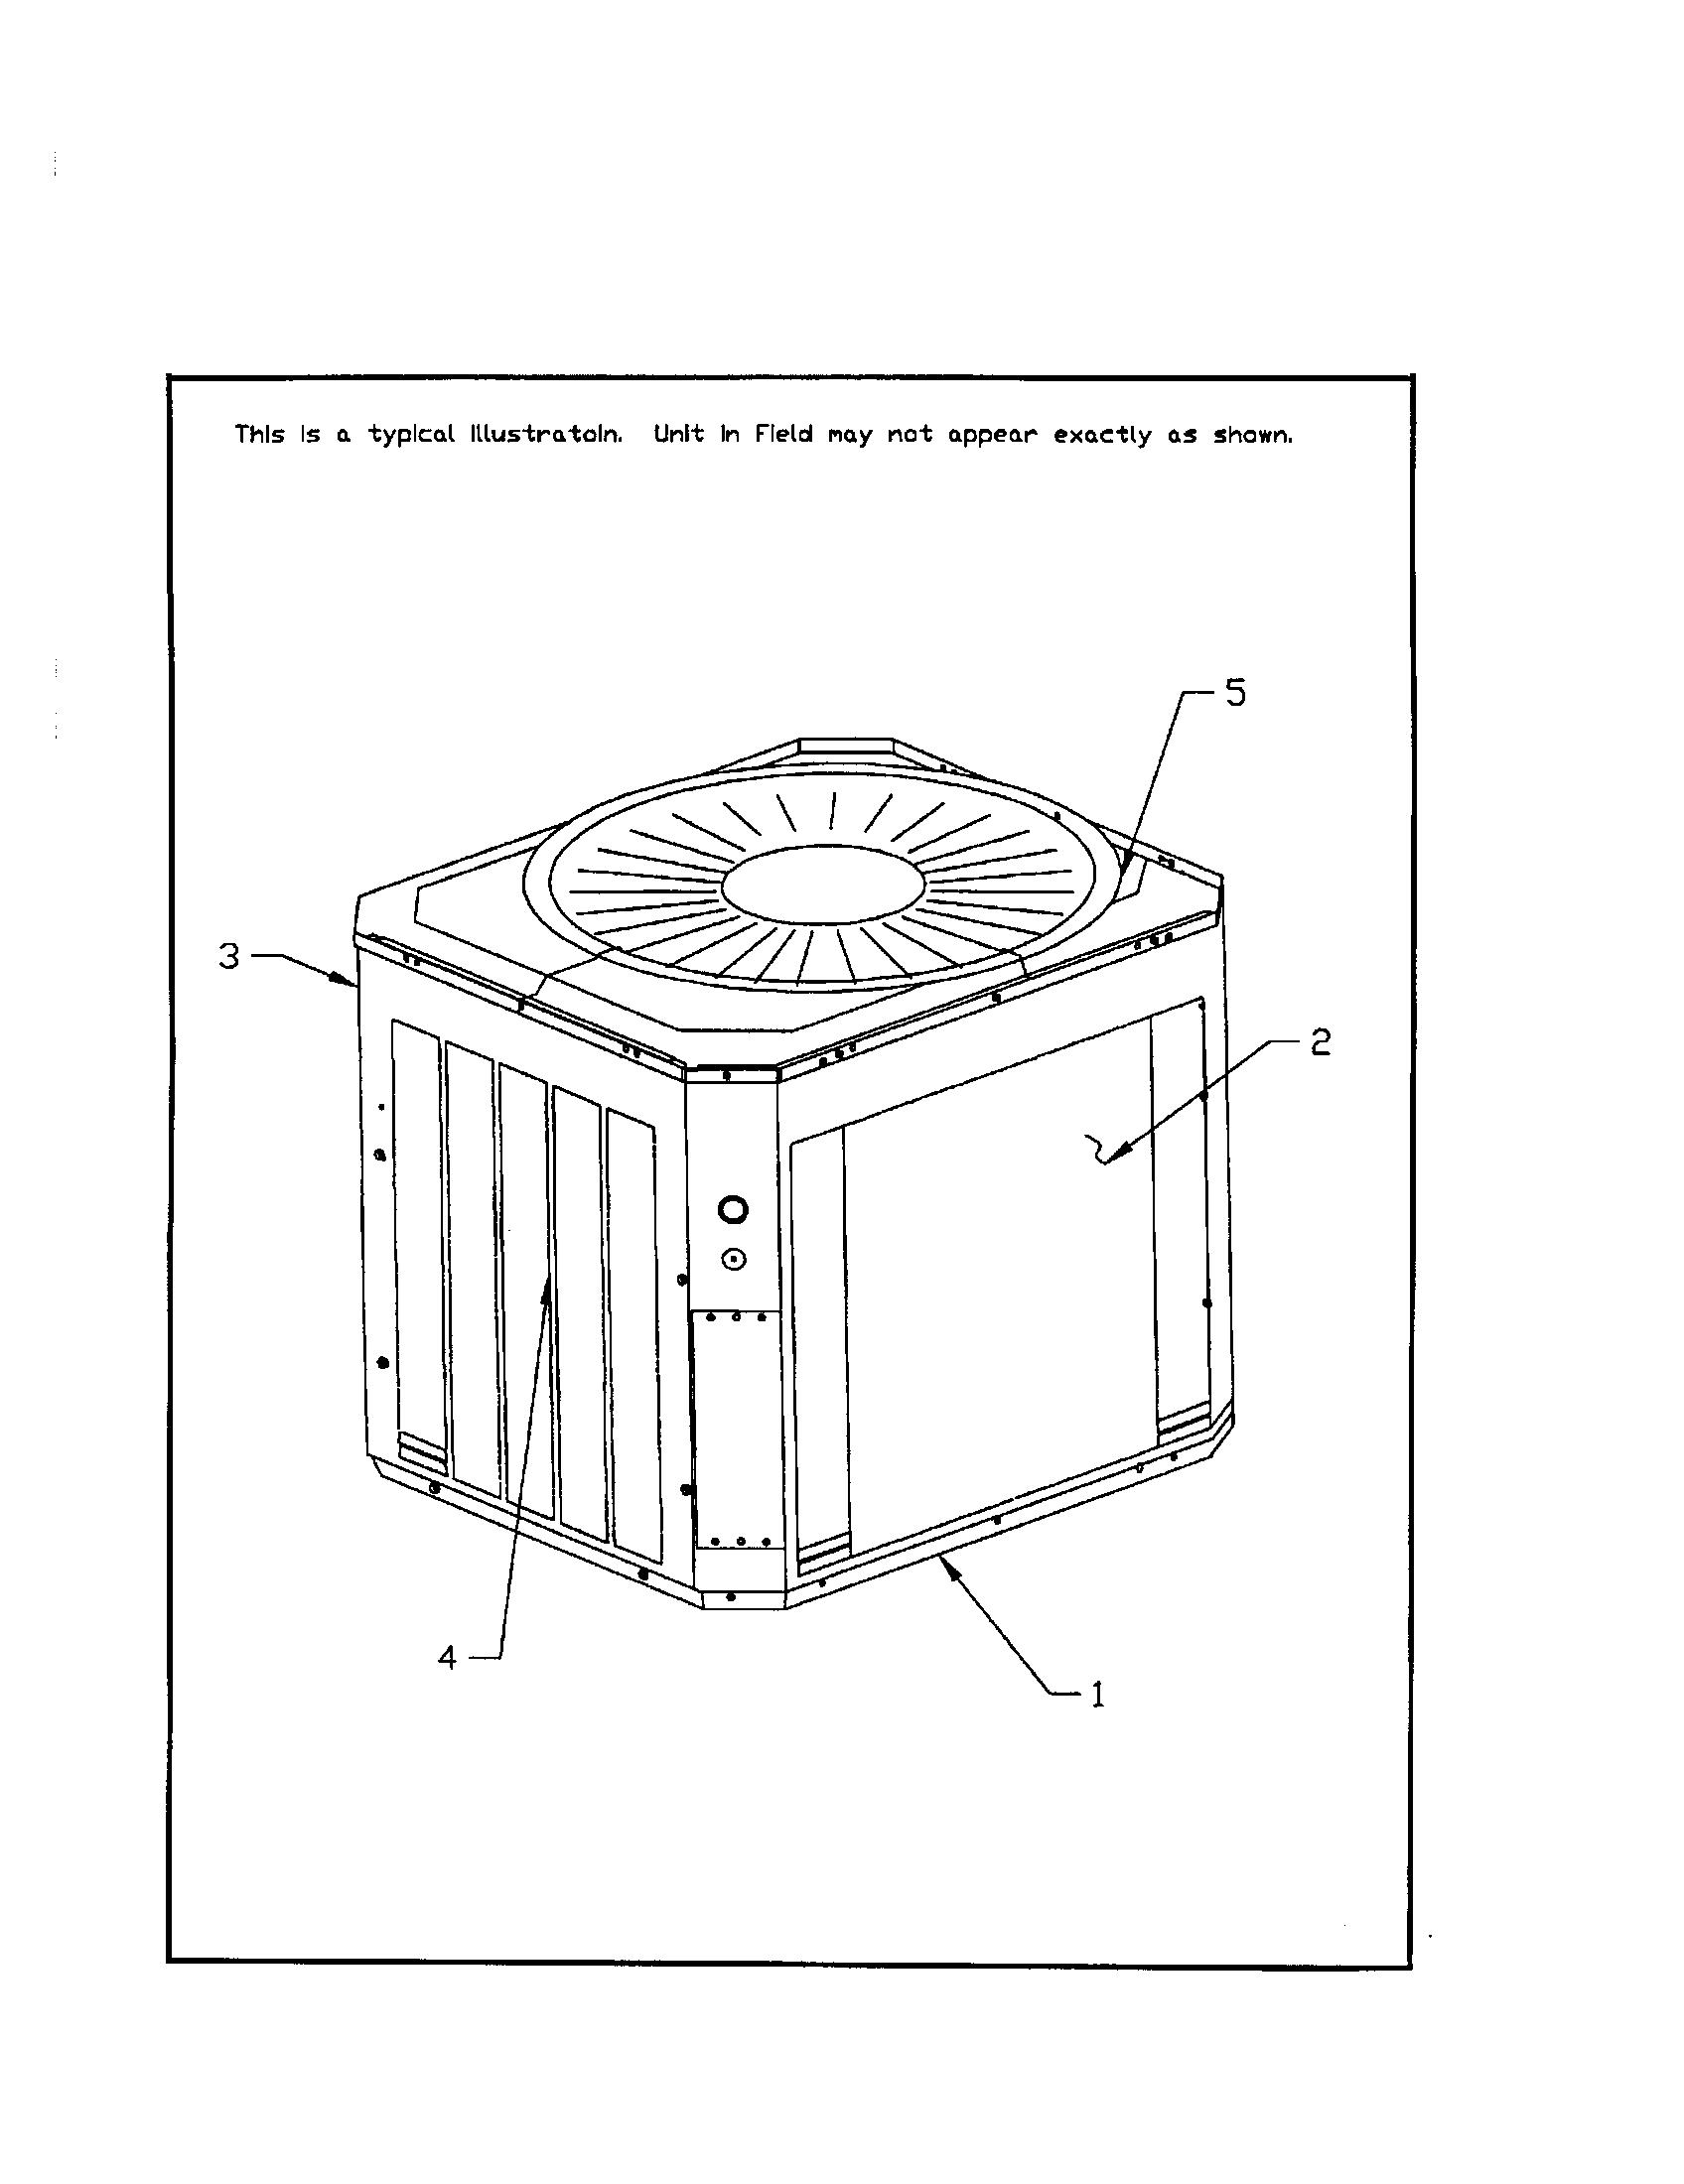 trane heat pump parts diagram honda goldwing gl1500 wiring hvac model ttx048d100a0 sears